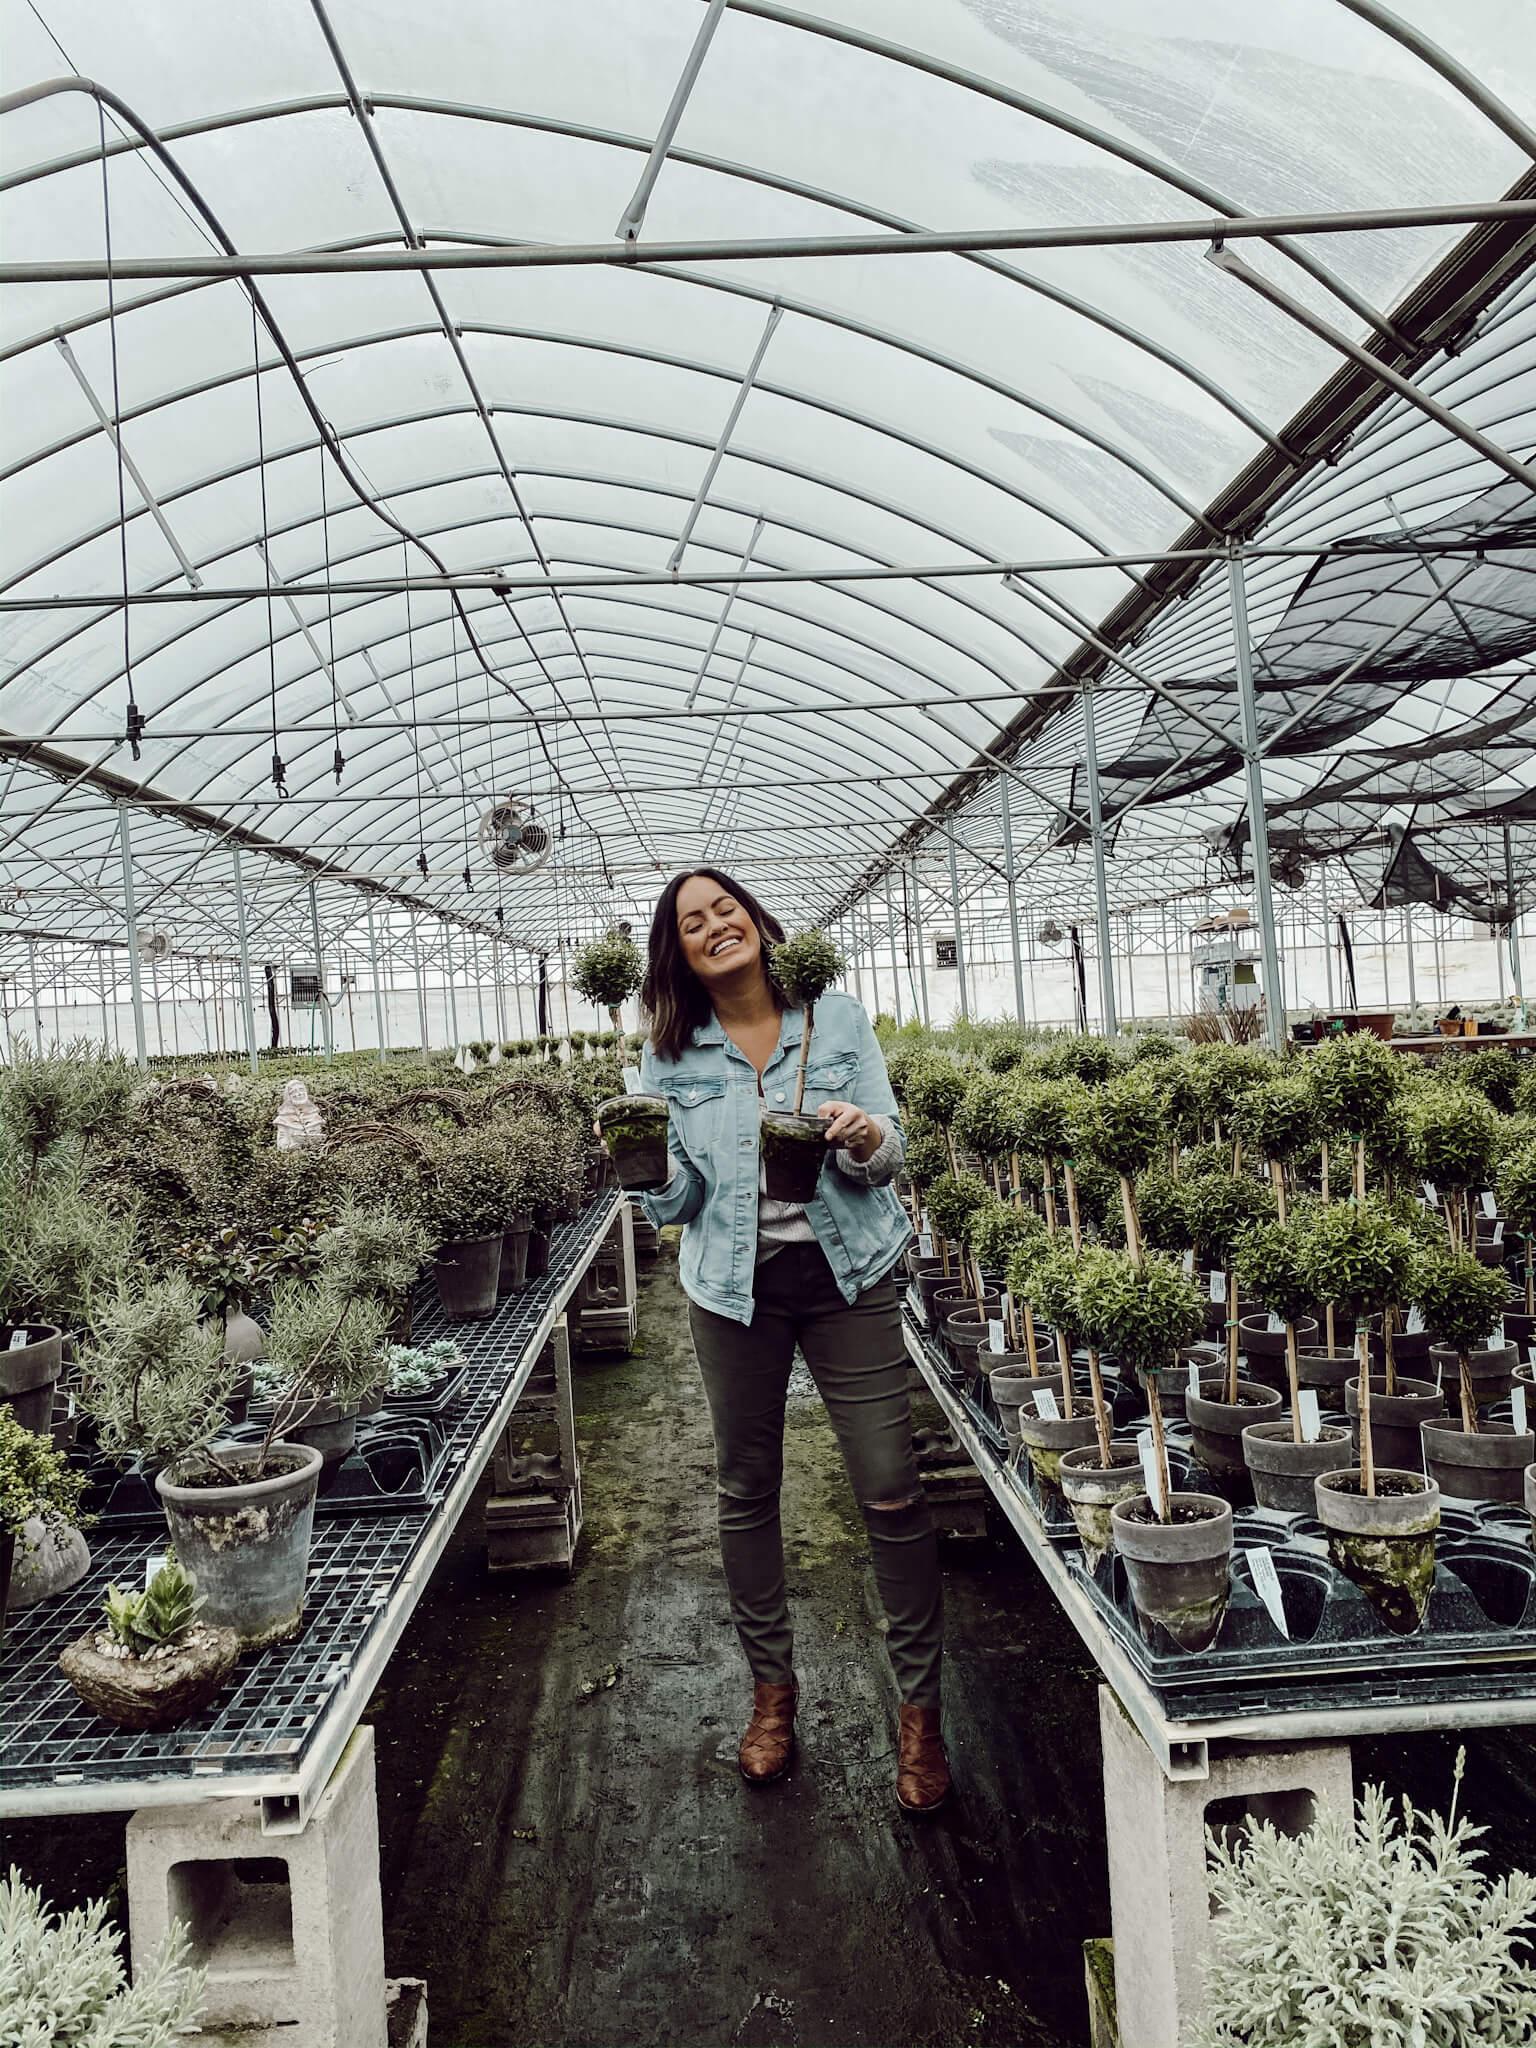 Best Plants for Farmhouse Style